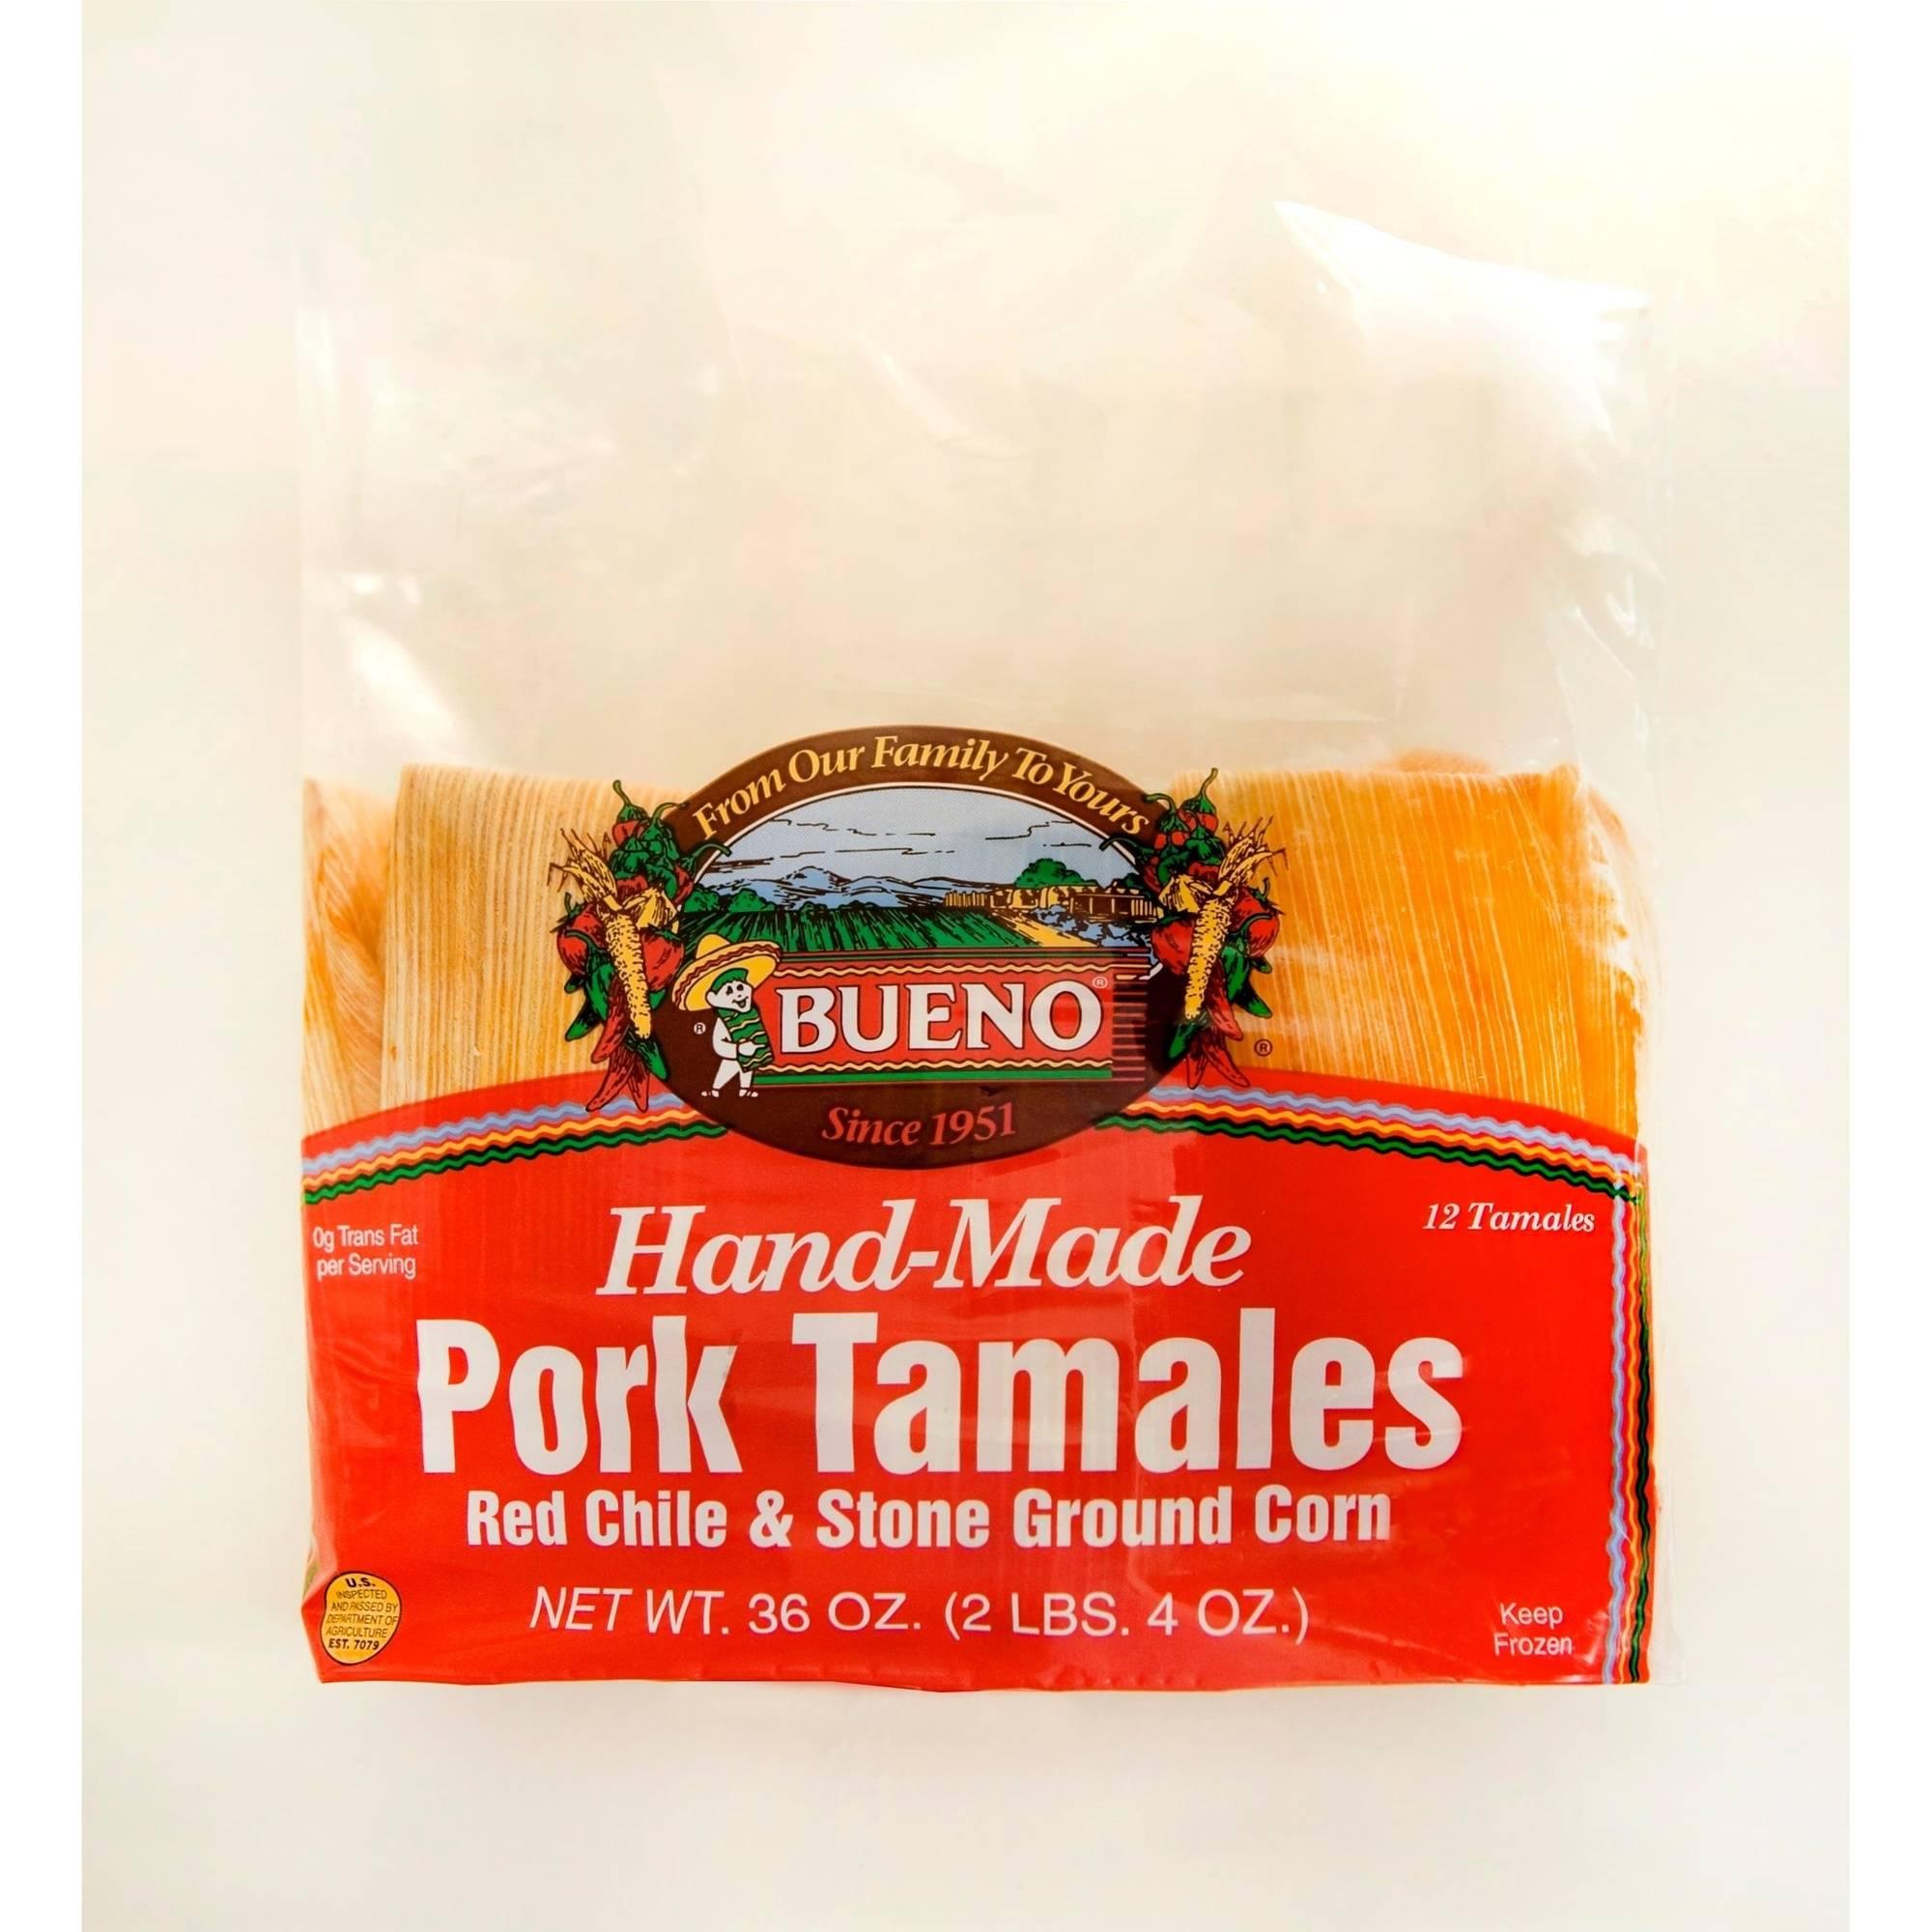 Bueno Hand-Made Pork Tamales, 36 oz.